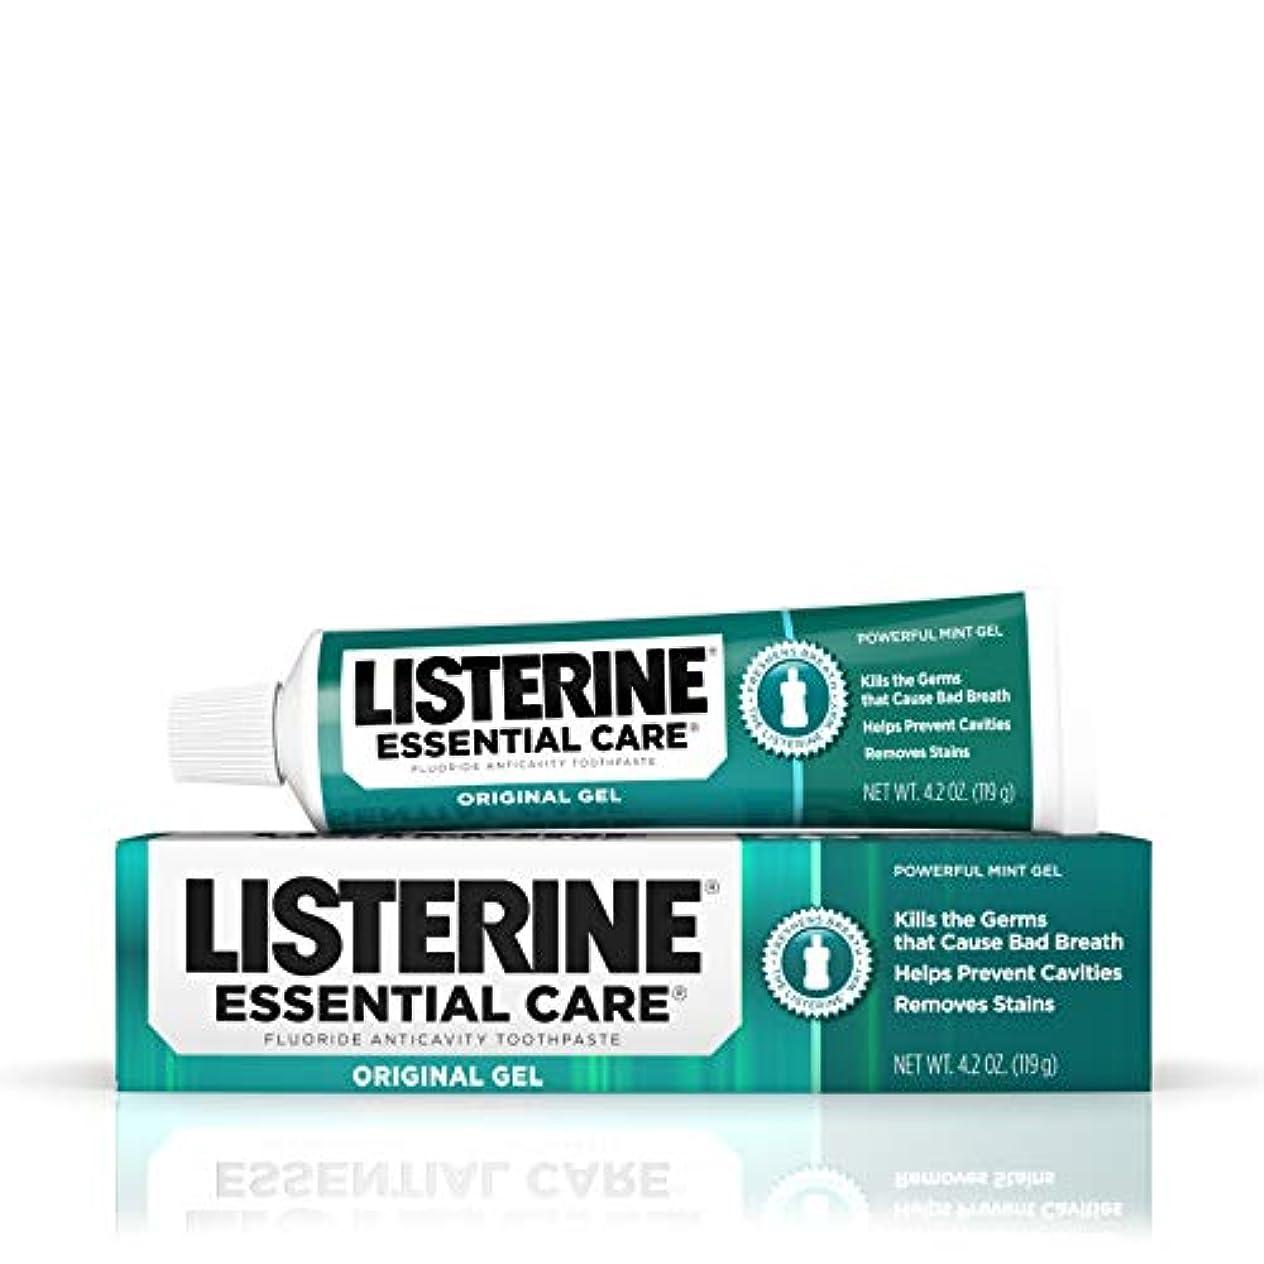 ガラス干渉病院海外直送品Listerine Essential Care Toothpaste Gel Original, Powerful Mint 4.2 oz by Listerine